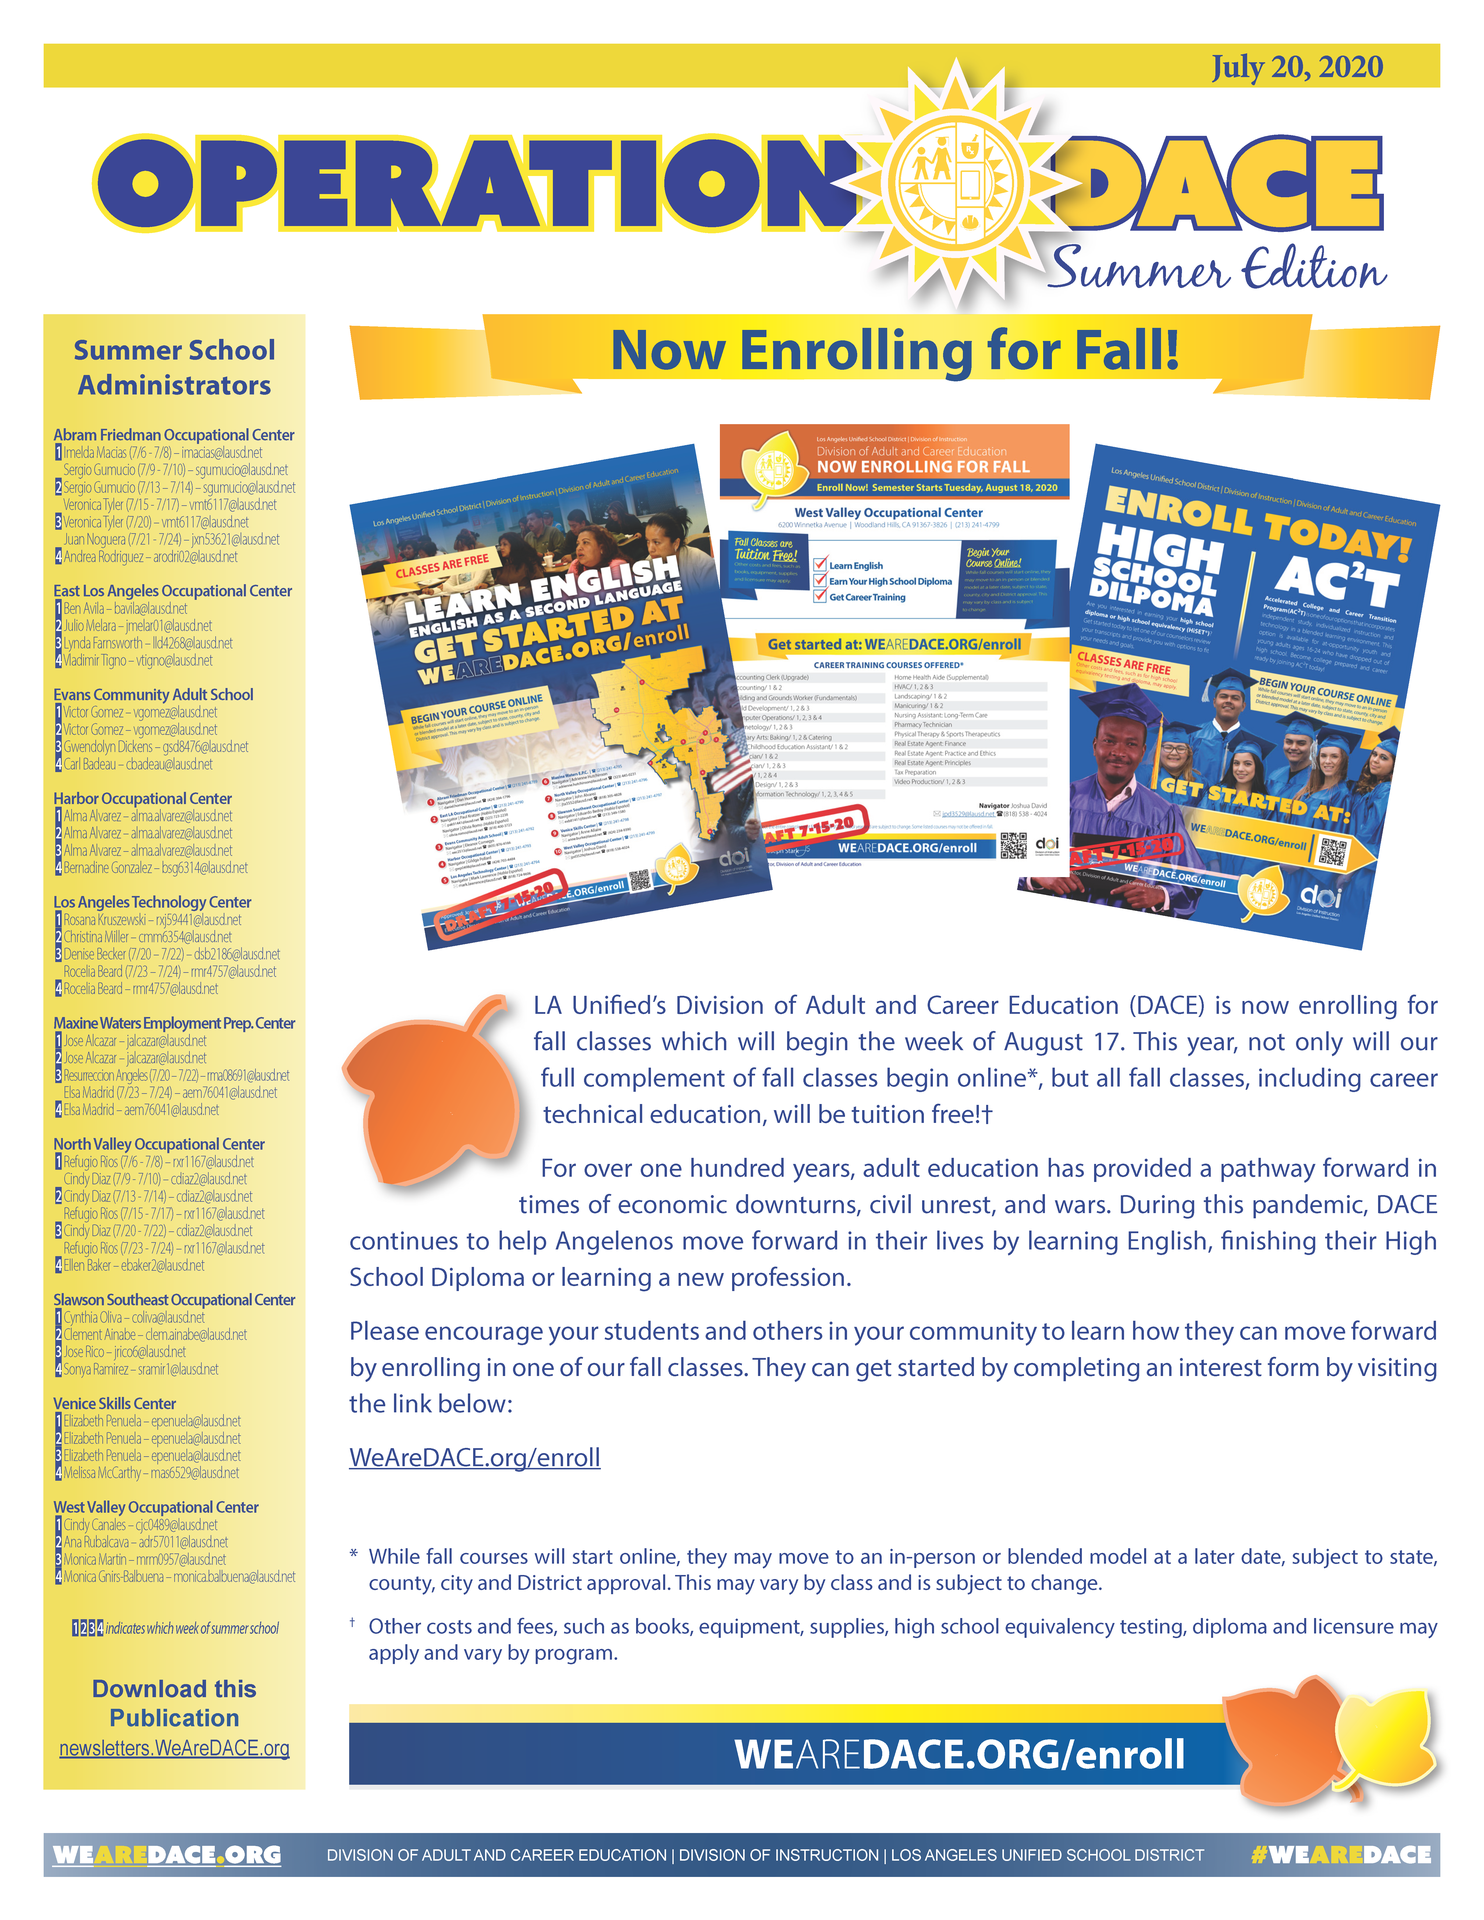 DACE Summer Newsletter - July 20, 2020 Thumbnail